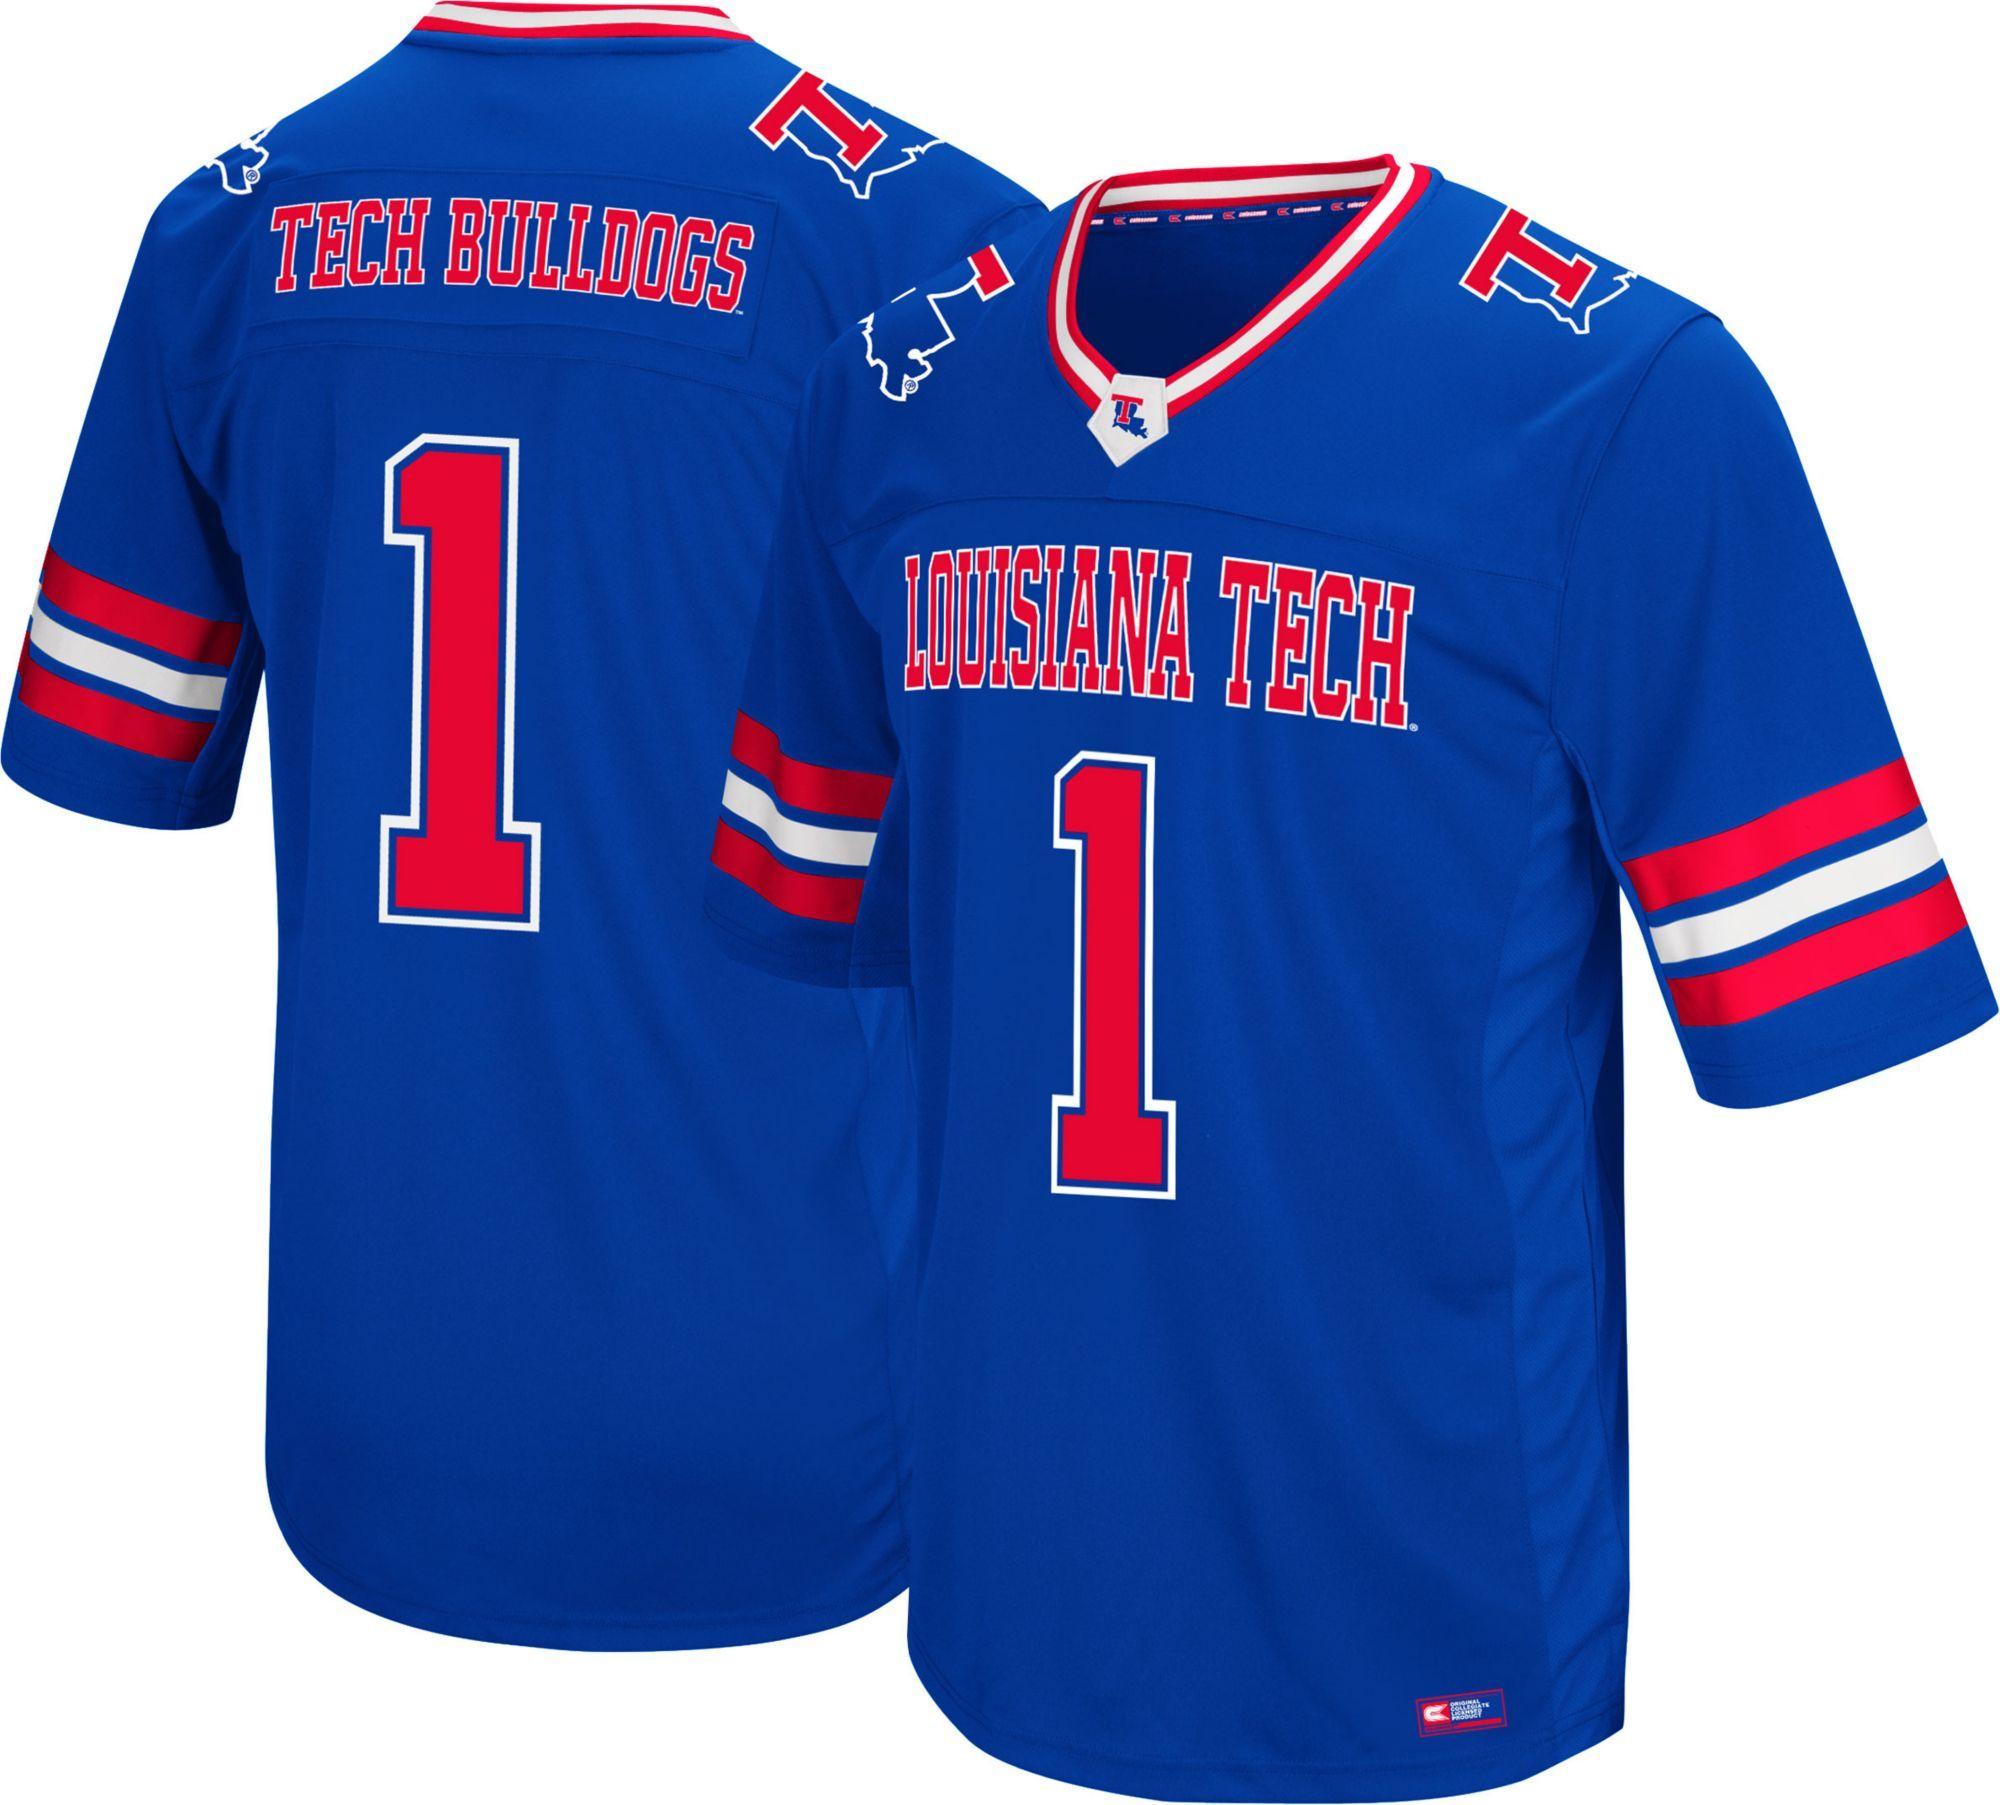 Colosseum Men's Louisiana Tech Bulldogs 1 Blue Hail Mary